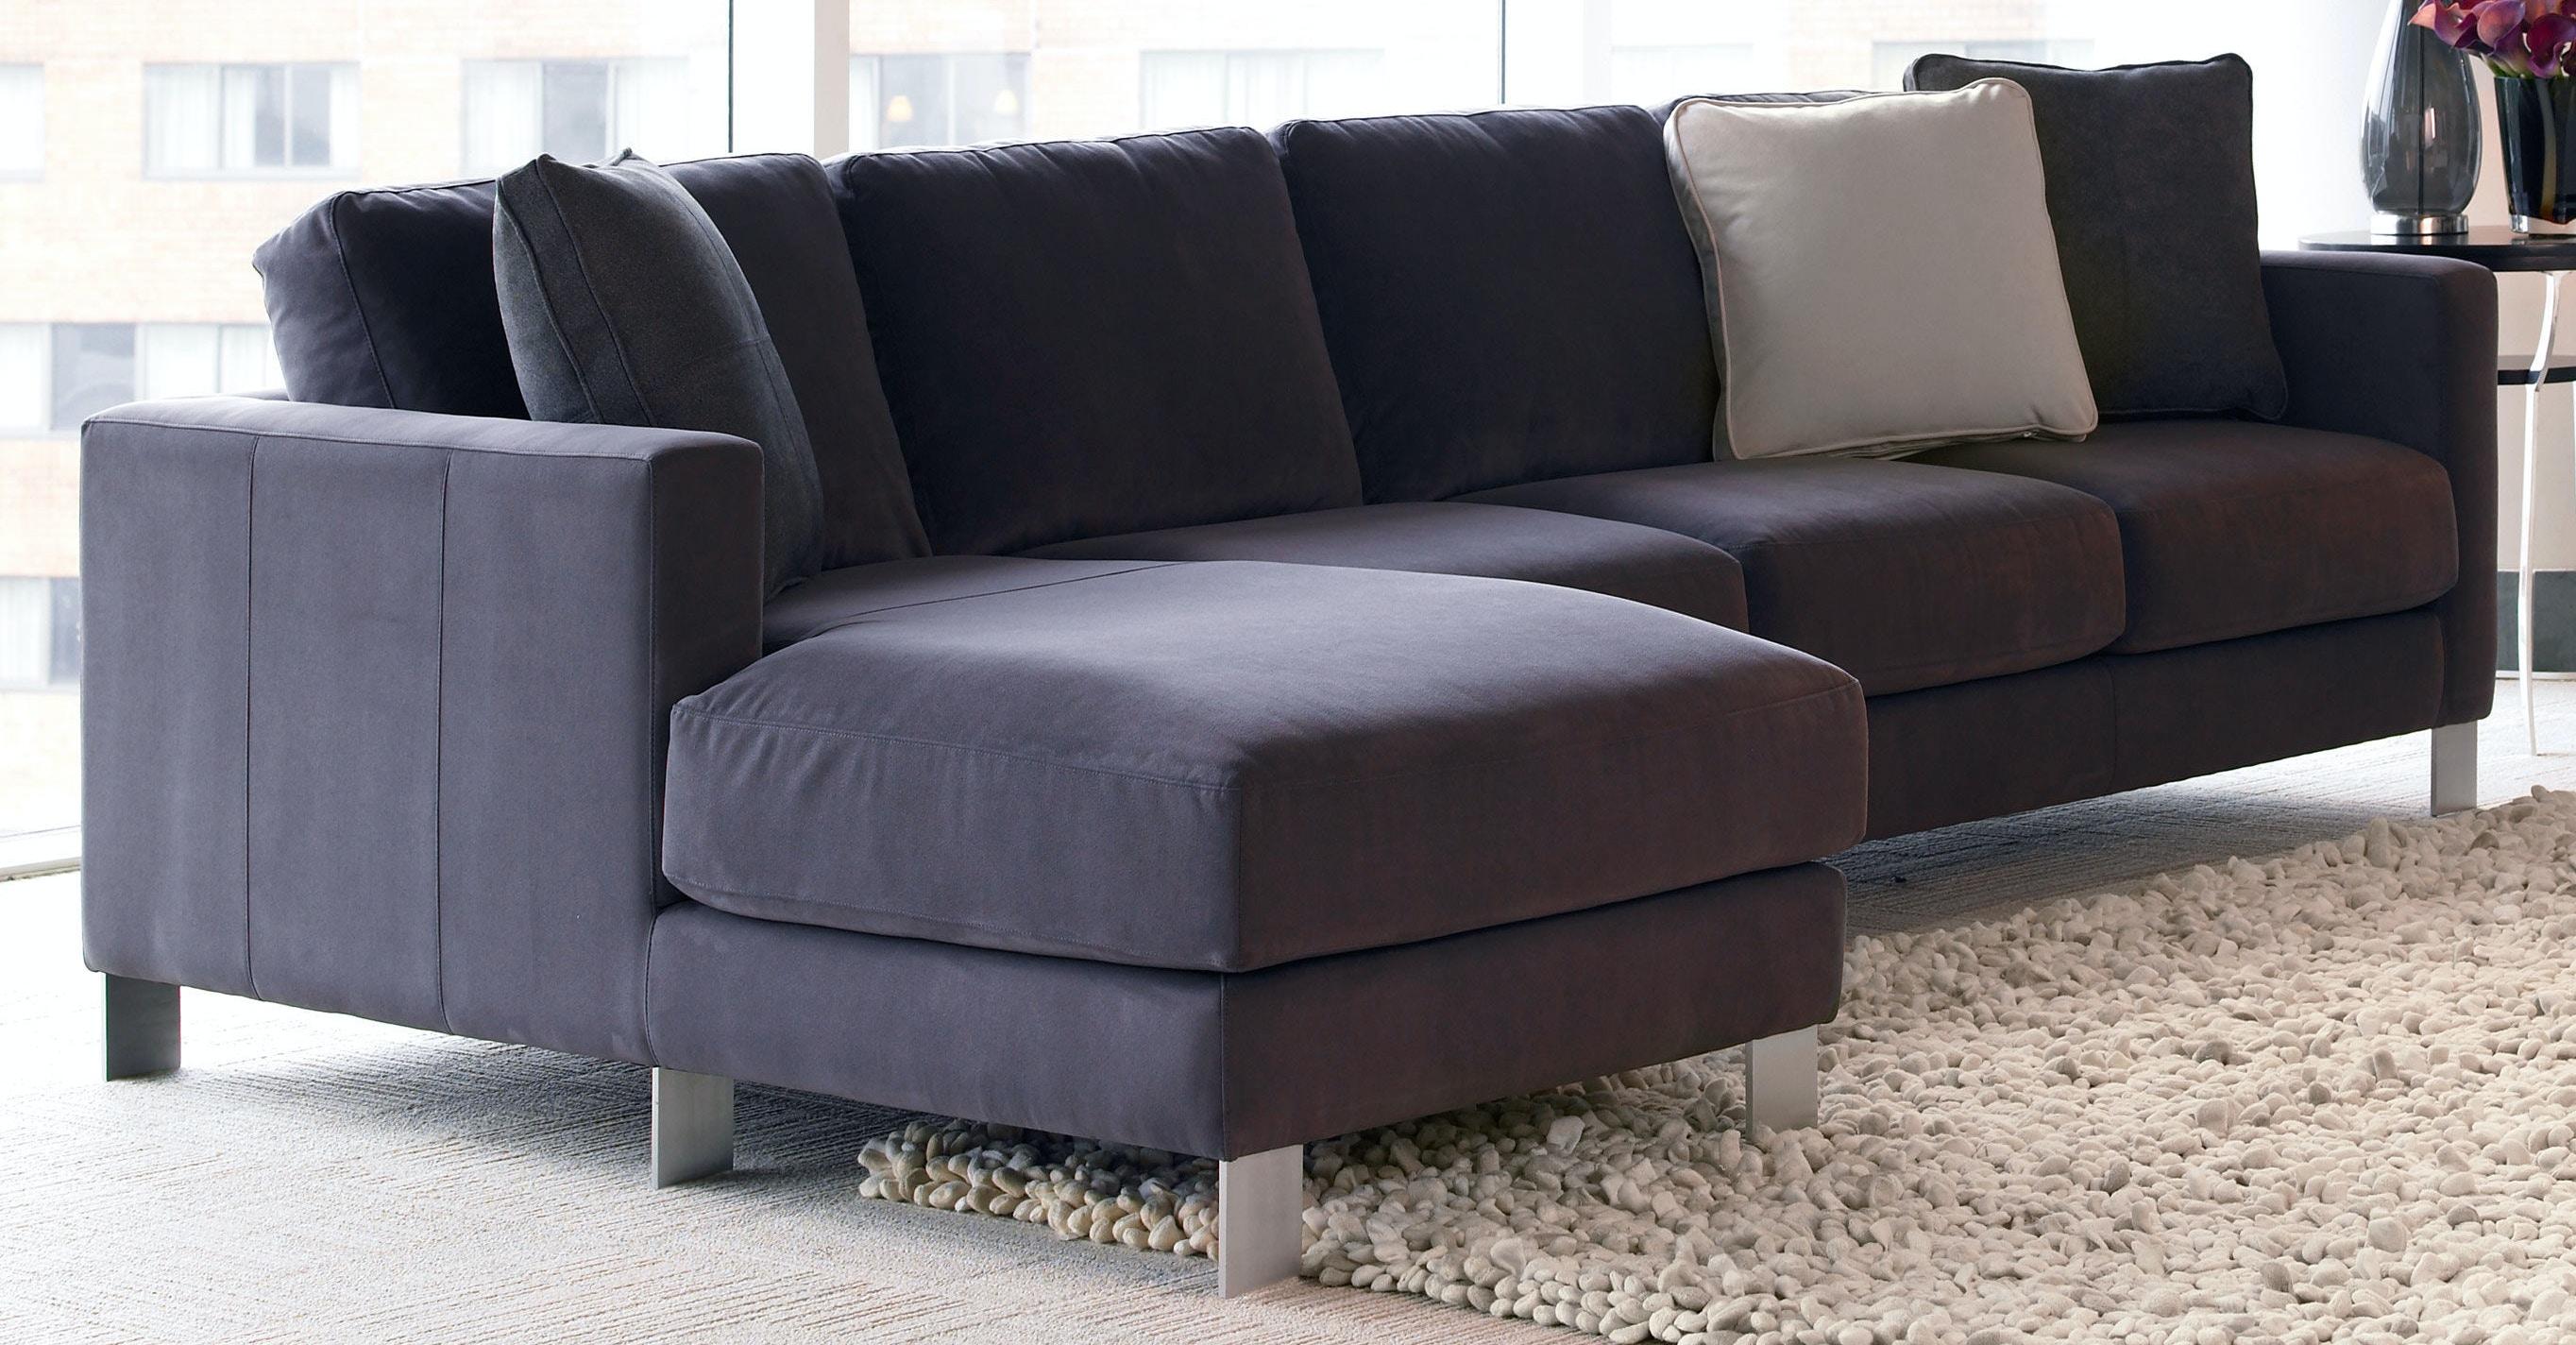 American Leather Sofa Beds Design Inspiration Images Gallery Living Room Sectionals Georgian Furnishing And Bergerhome New Rh Georgianfurnishing Com